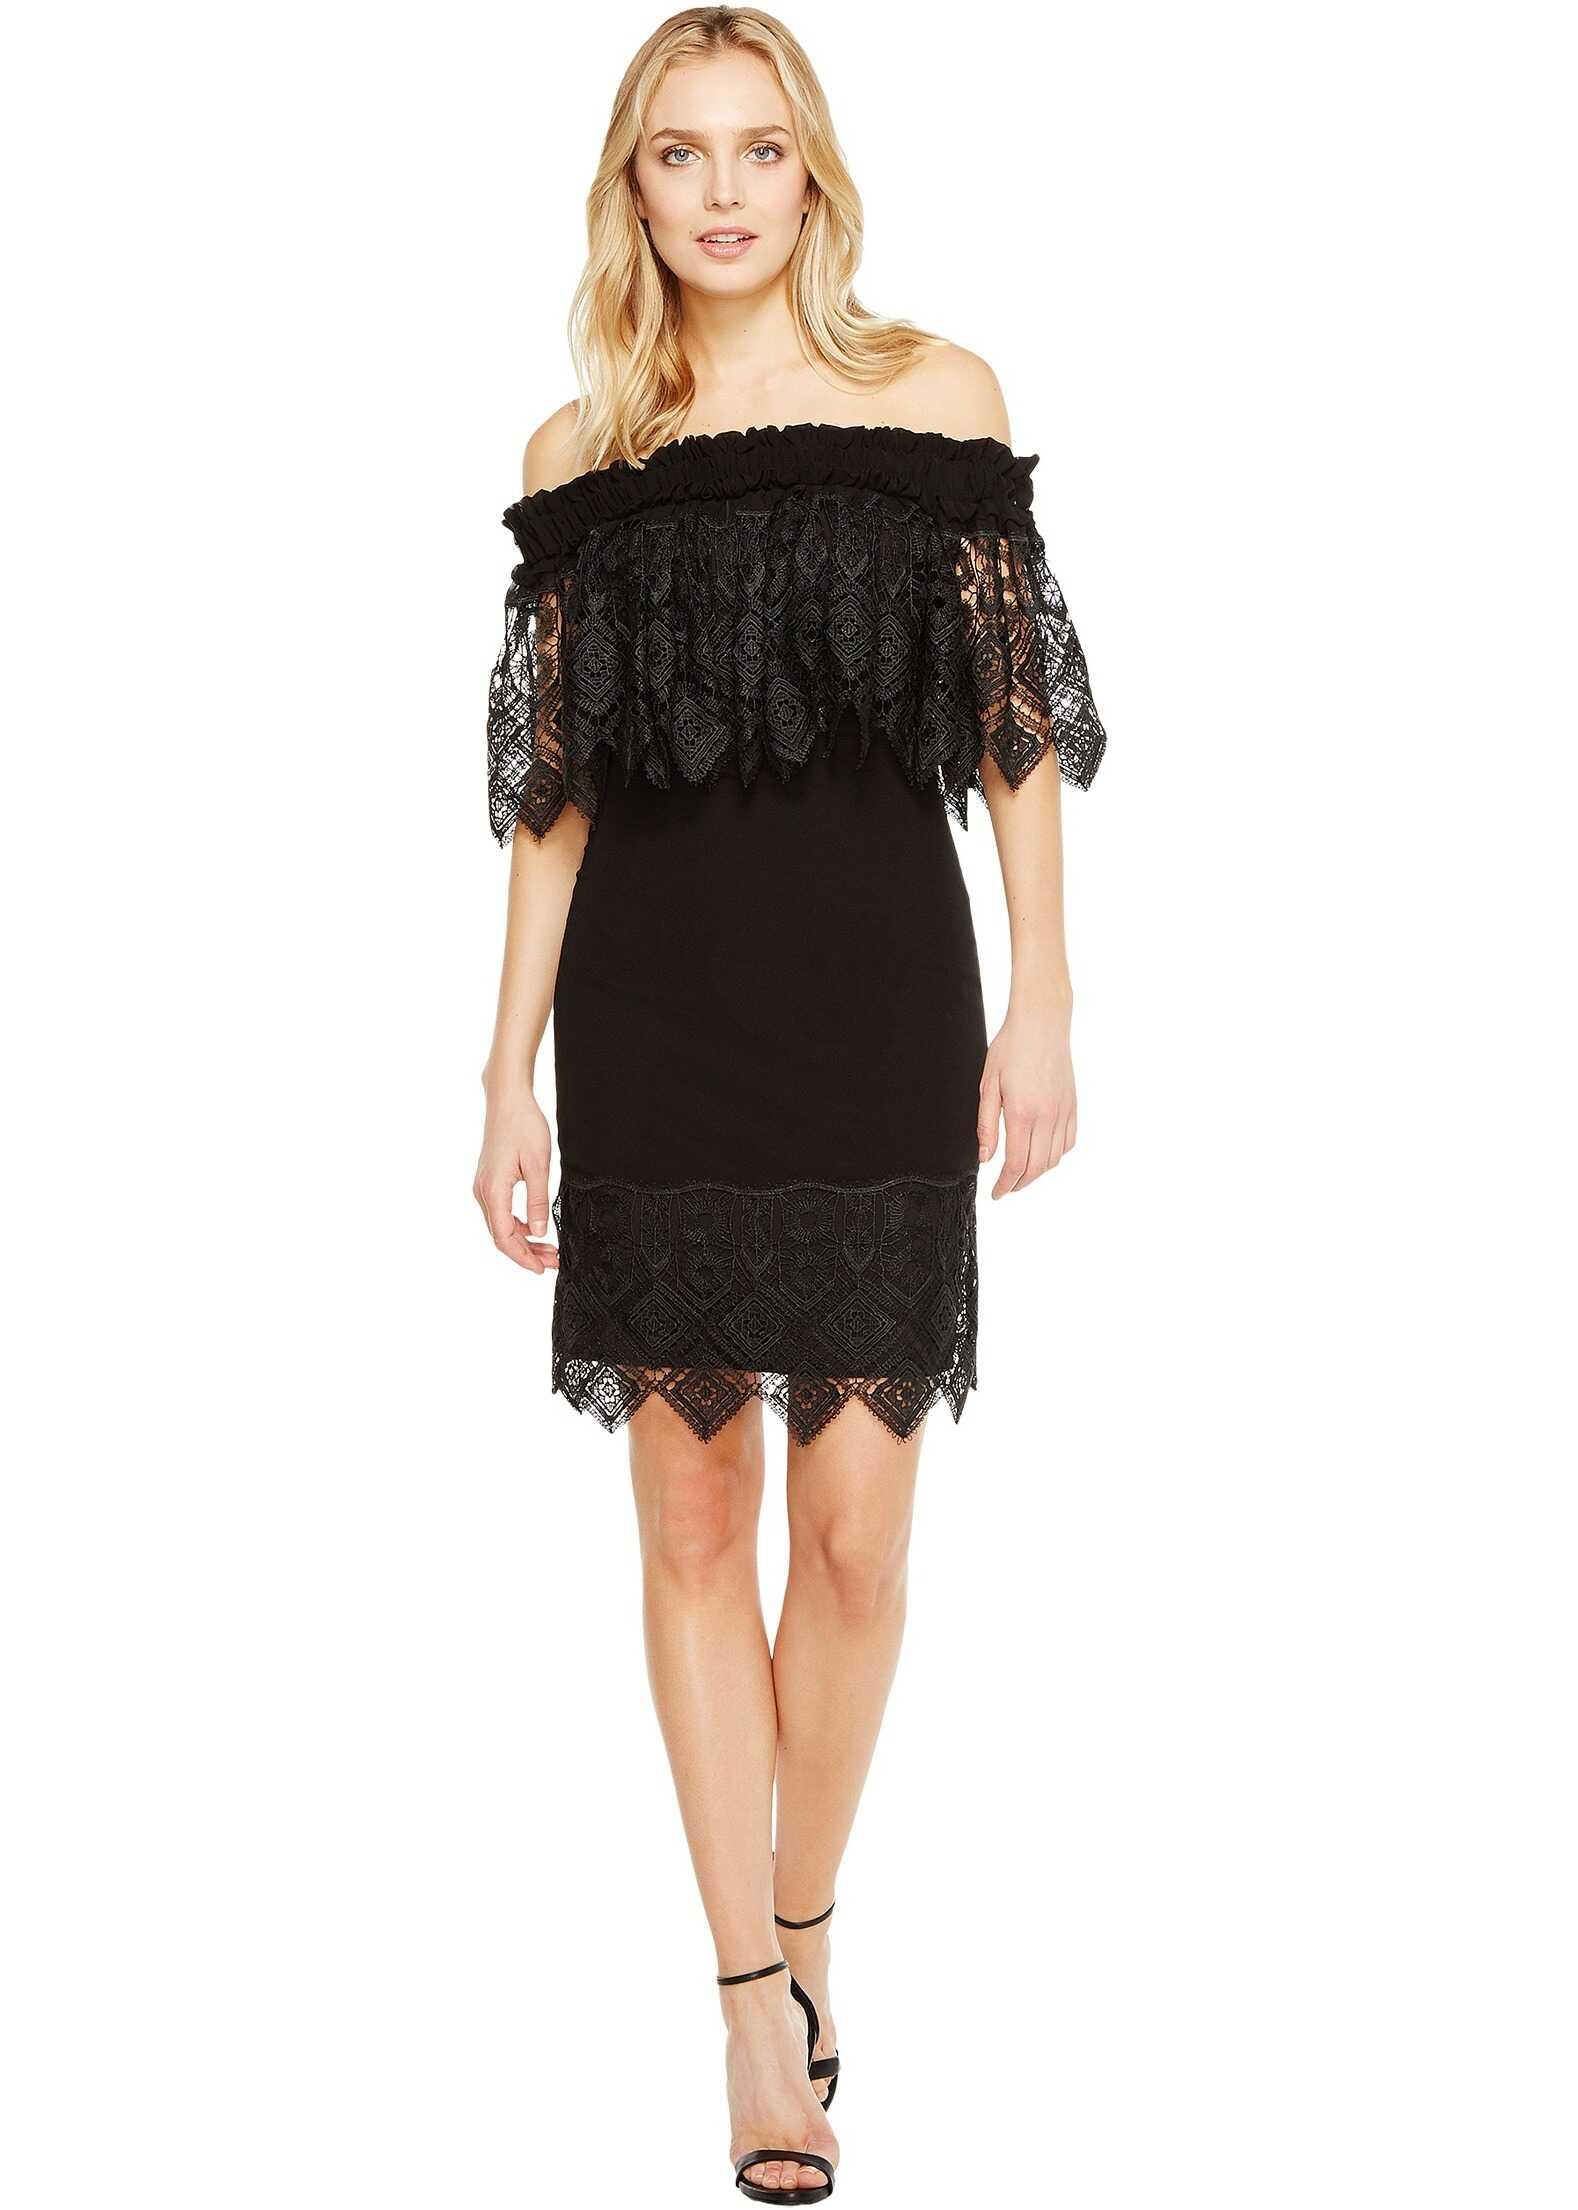 Badgley Mischka Off the Shoulder Silk Dress Trimmed in Lace Black